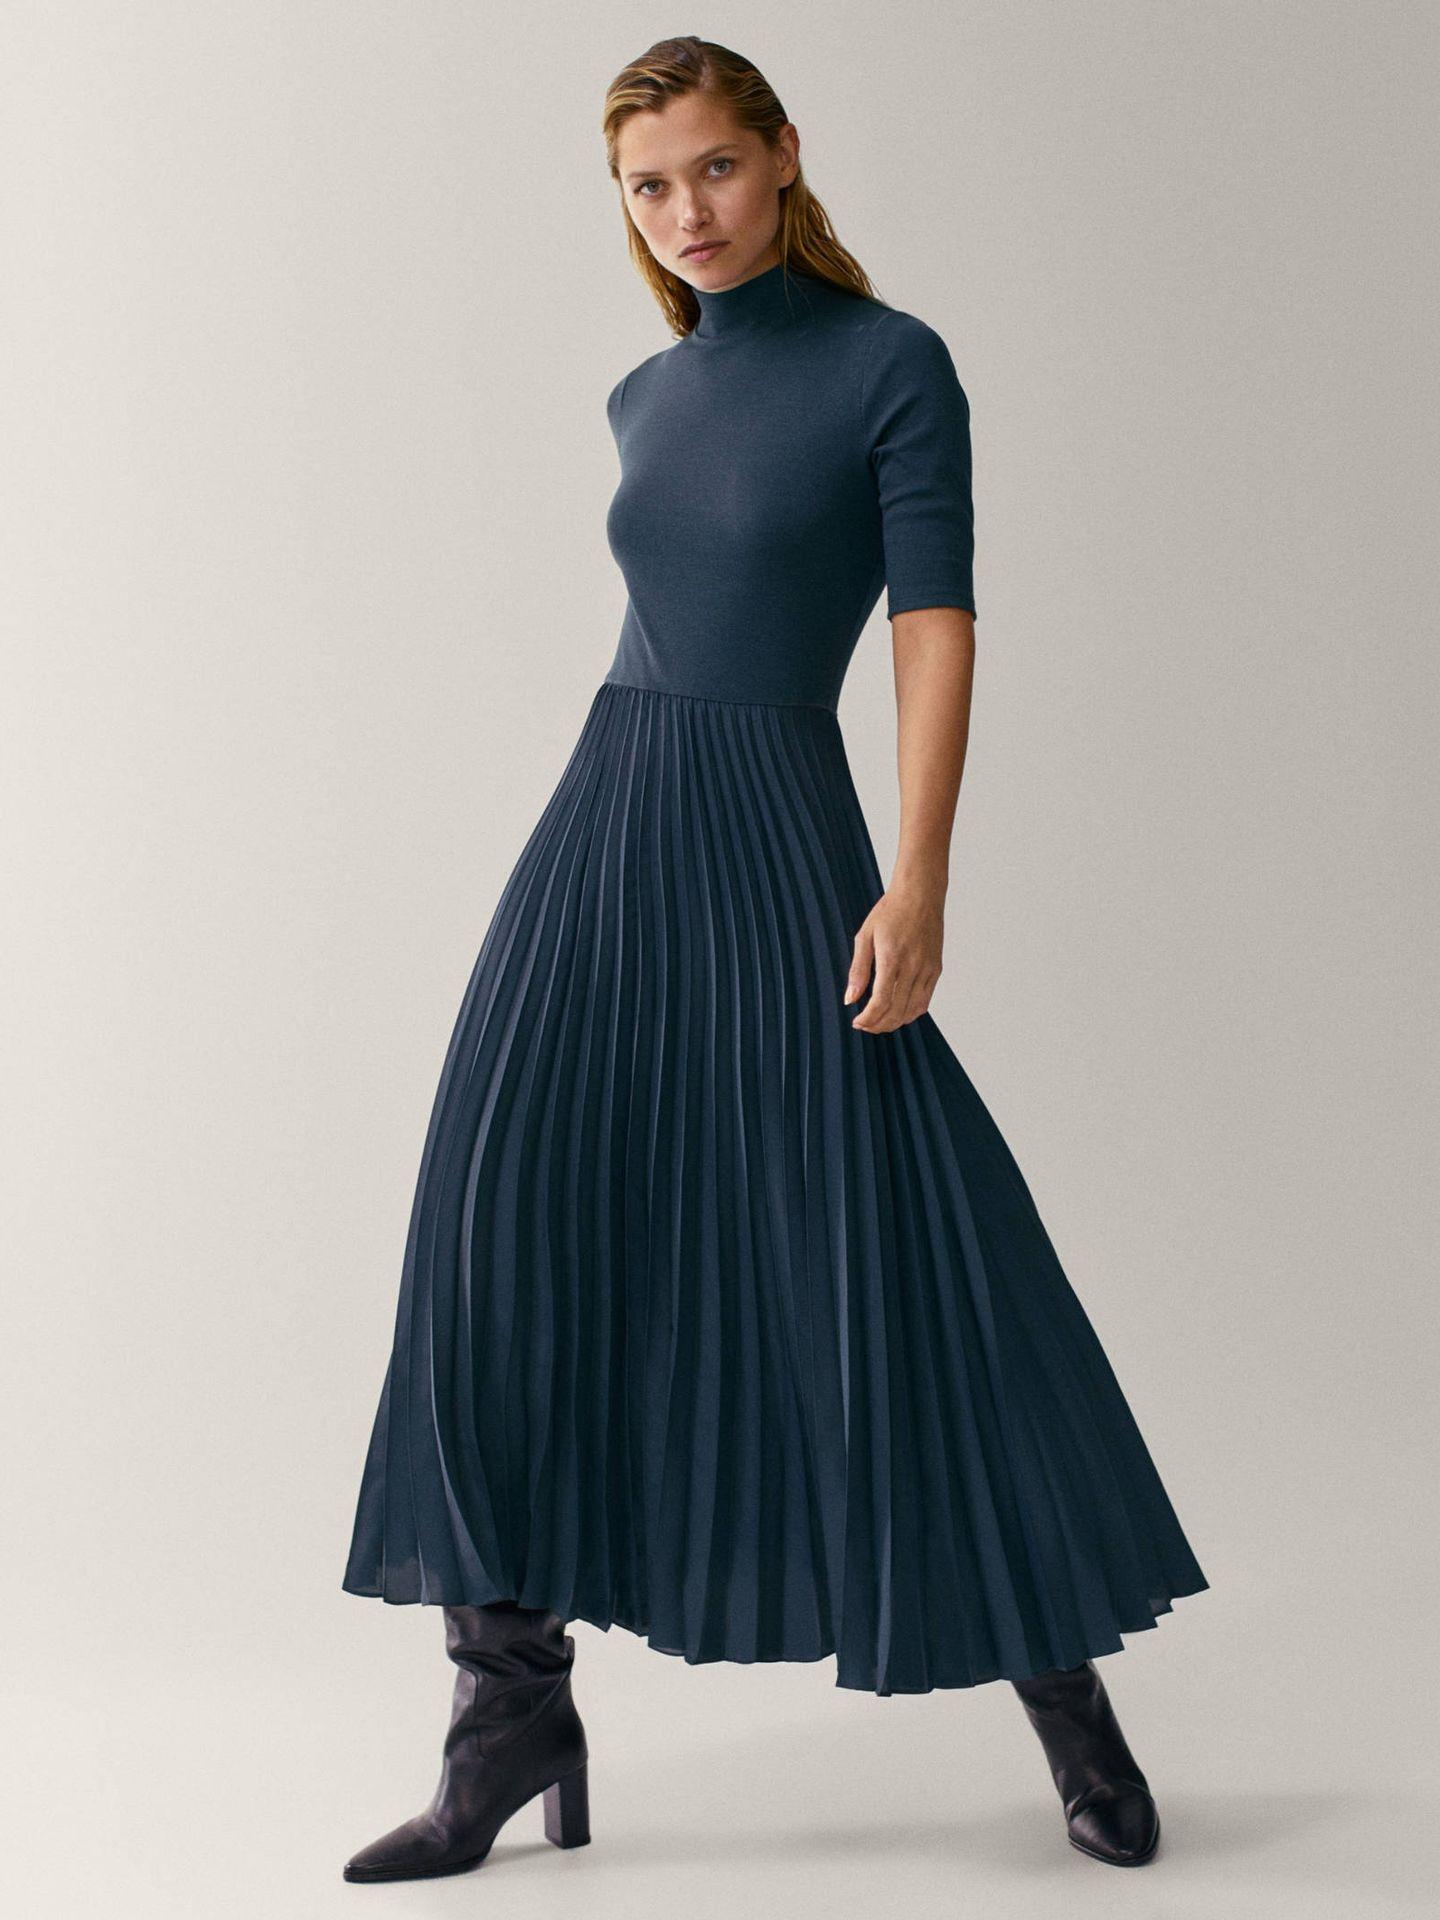 Renueva tus vestidos con Massimo Dutti. (Cortesía)